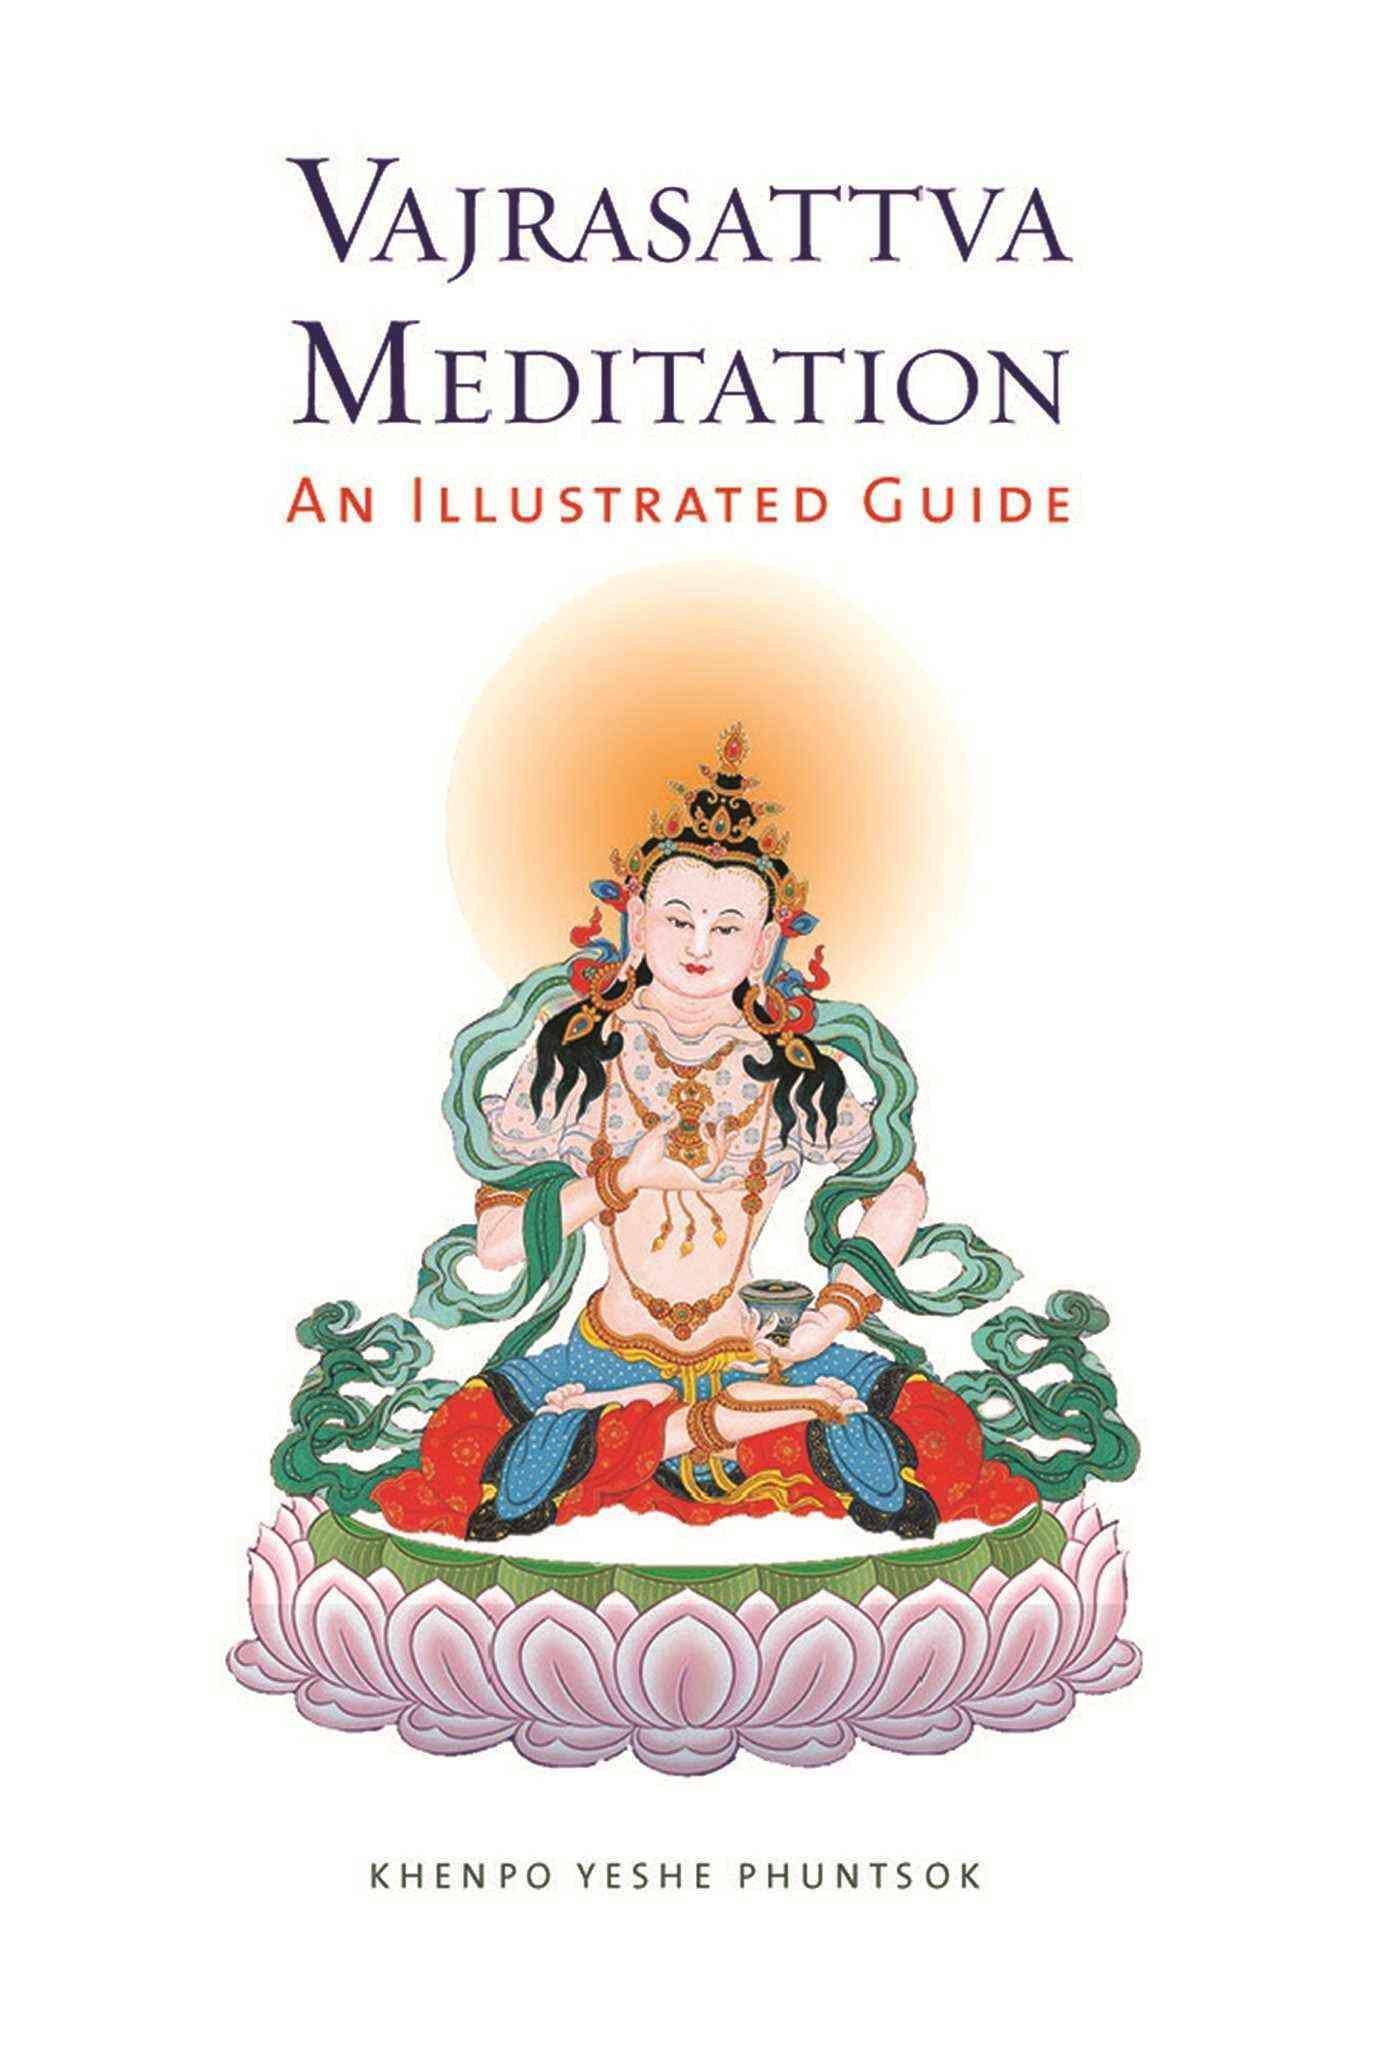 Vajrasattva meditation an illustrated guide buddhism pinterest explore tibetan buddhism buddha and more nvjuhfo Images